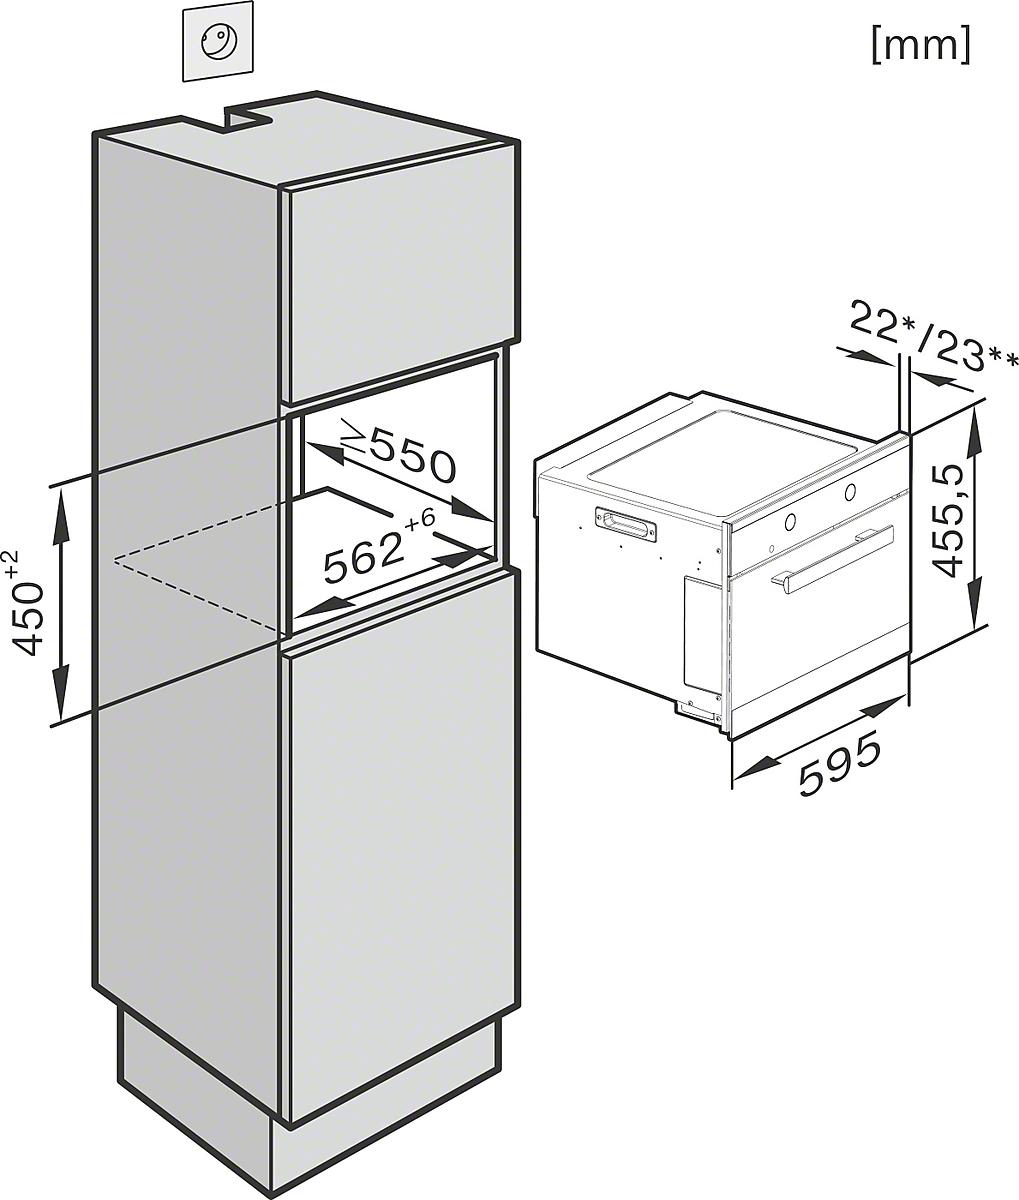 miele m 6260 tc einbau mikrowellenger t. Black Bedroom Furniture Sets. Home Design Ideas